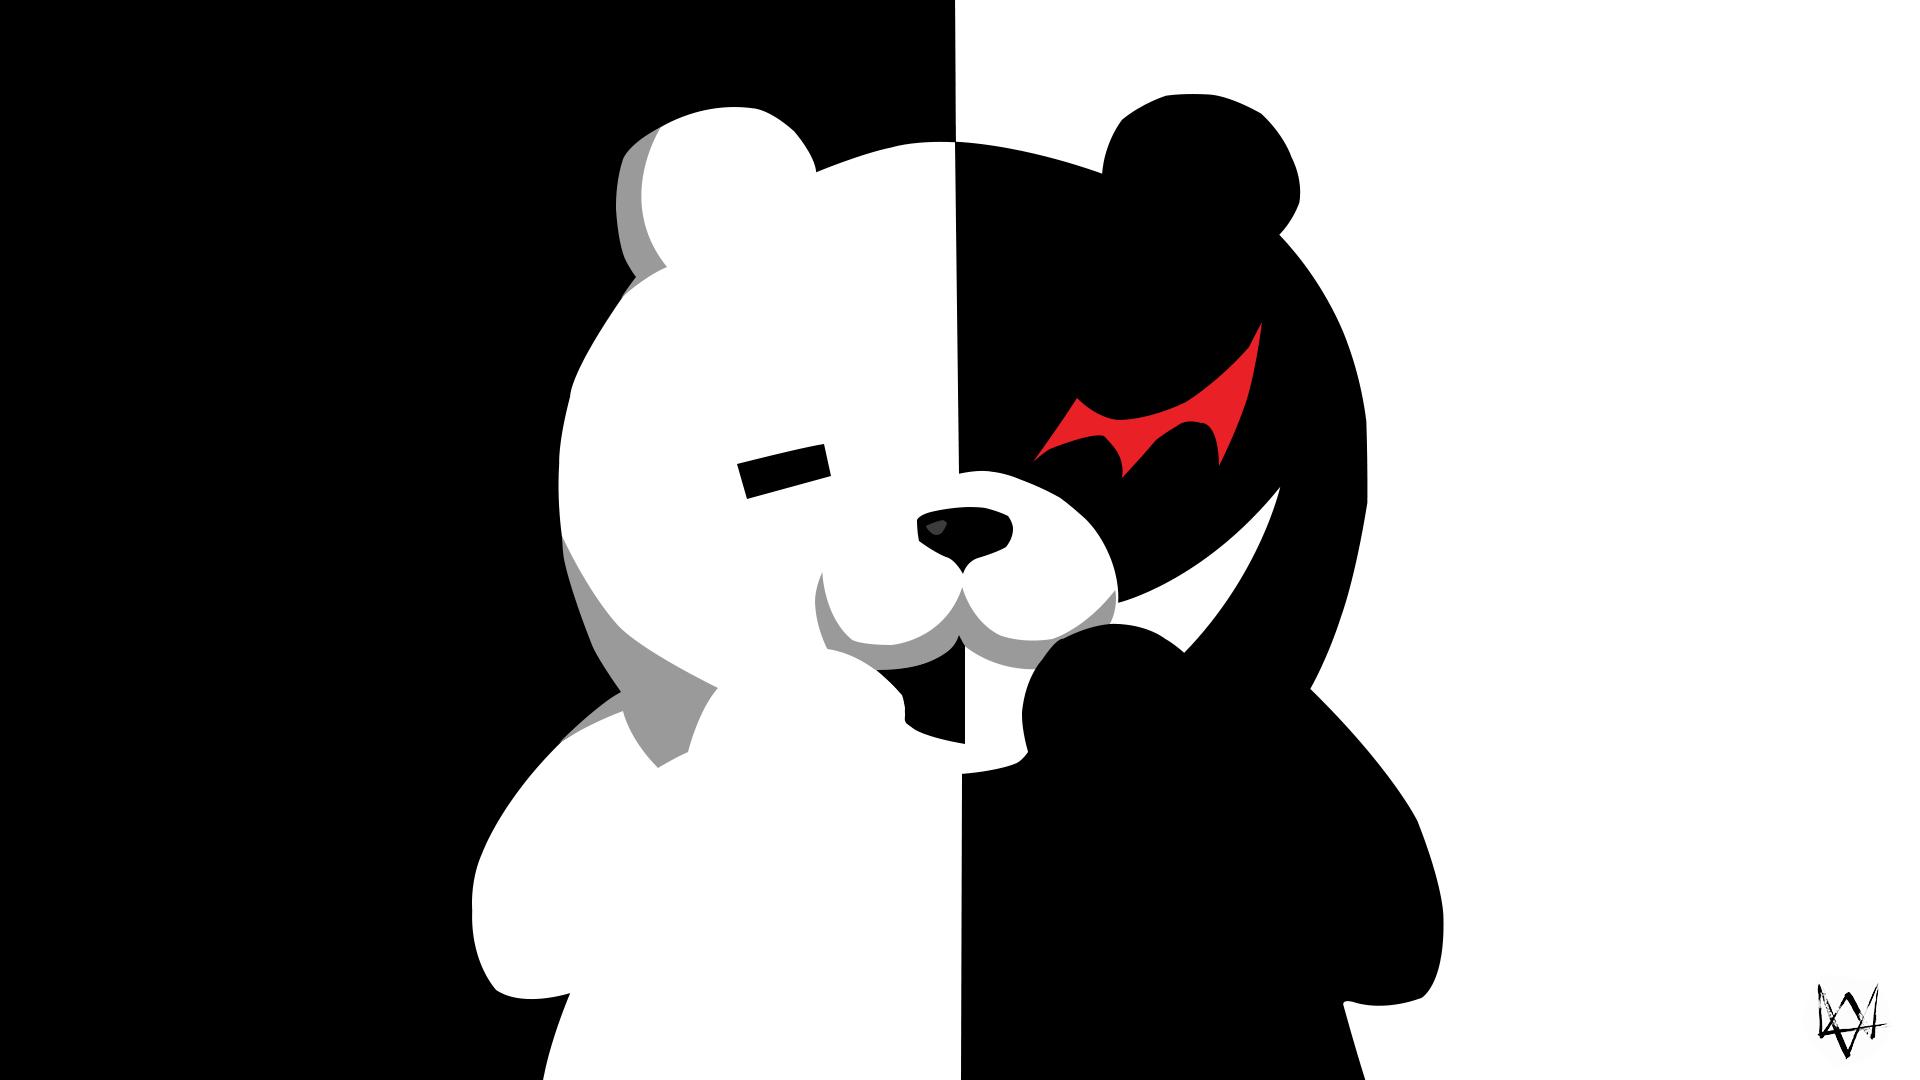 Danganronpa Monokuma